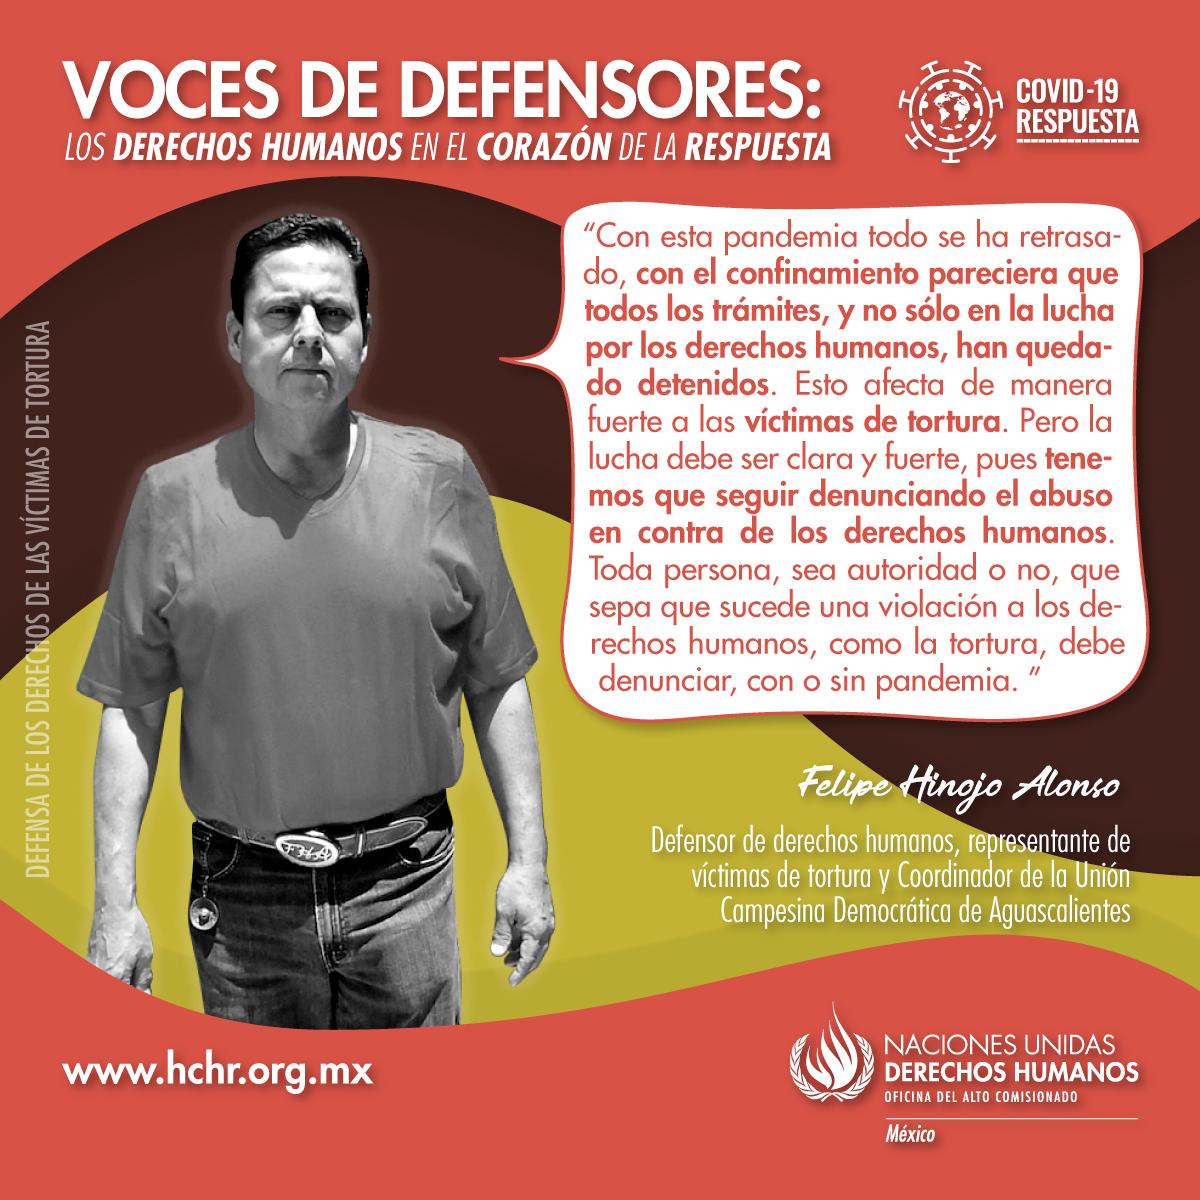 VocesDefensoras_COVID_FelipeH